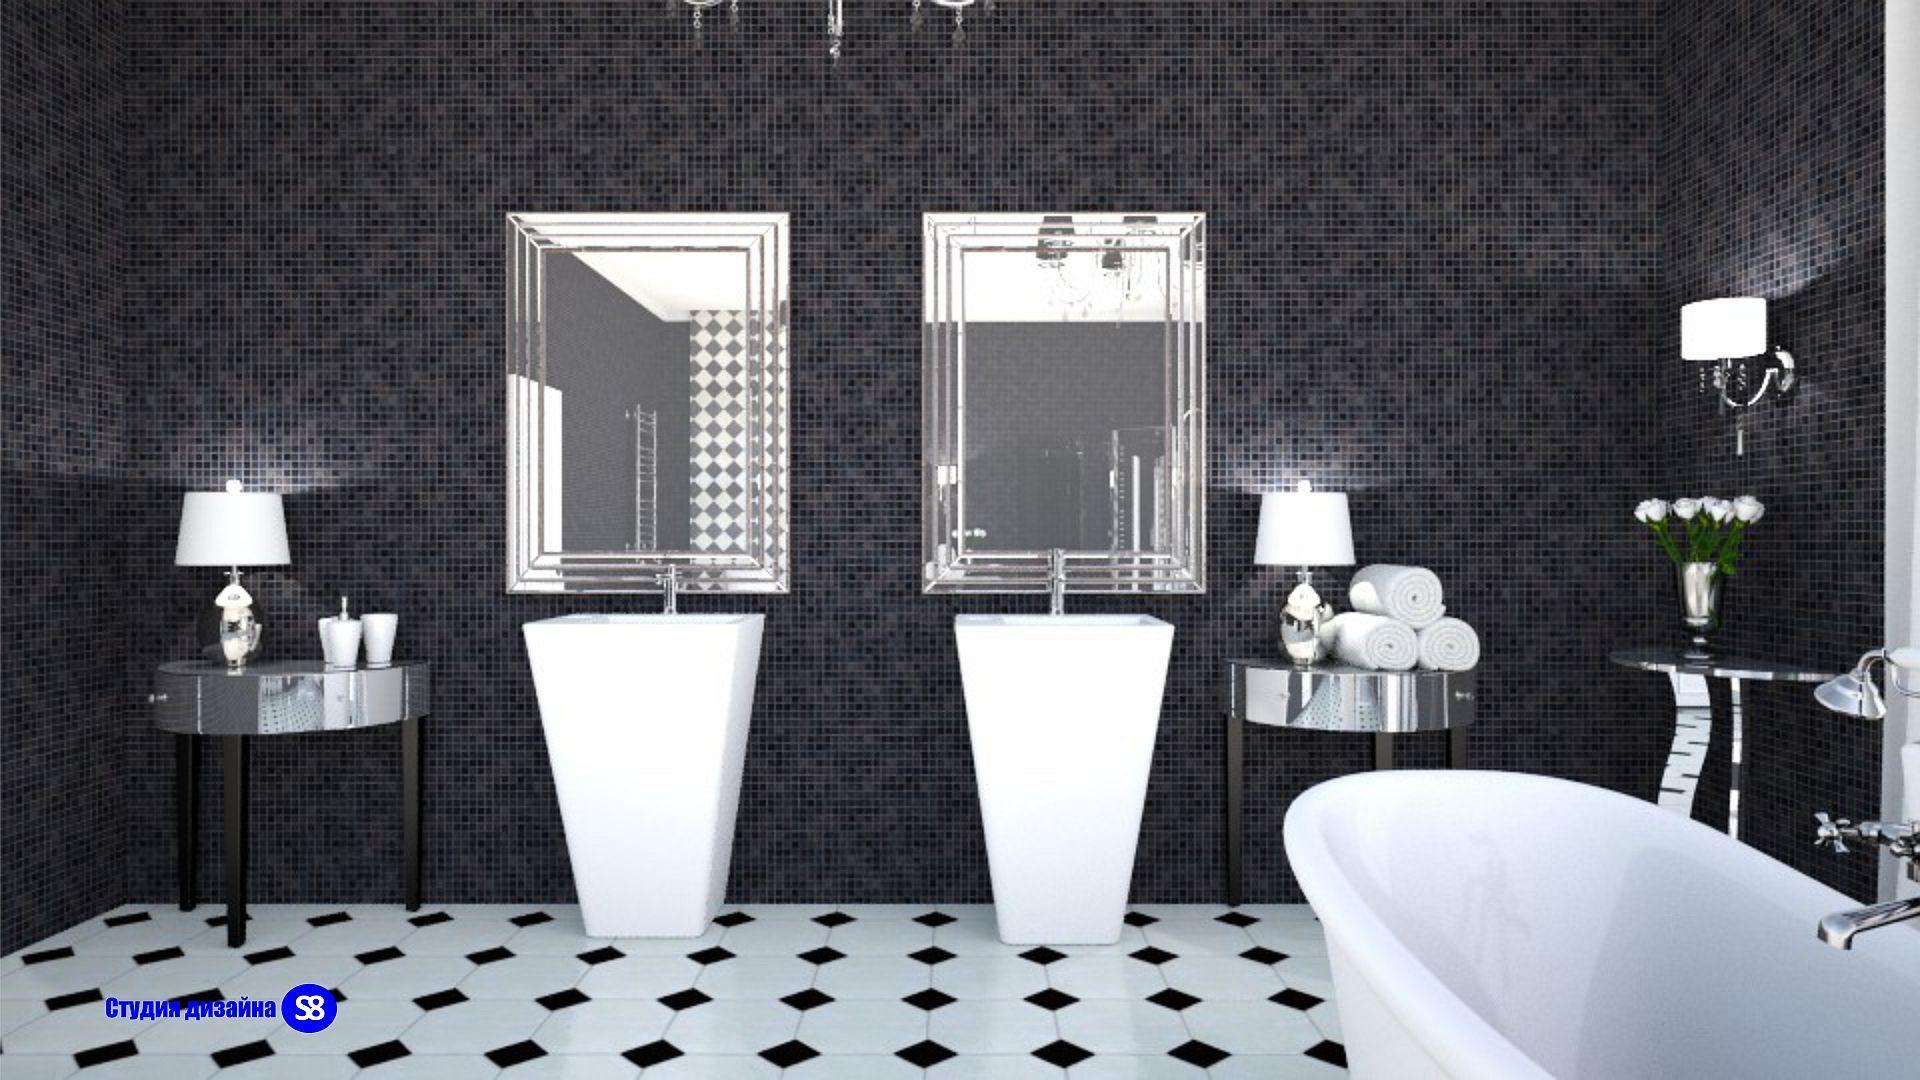 Bathroom interior hd bathroom  bathrooms  pinterest